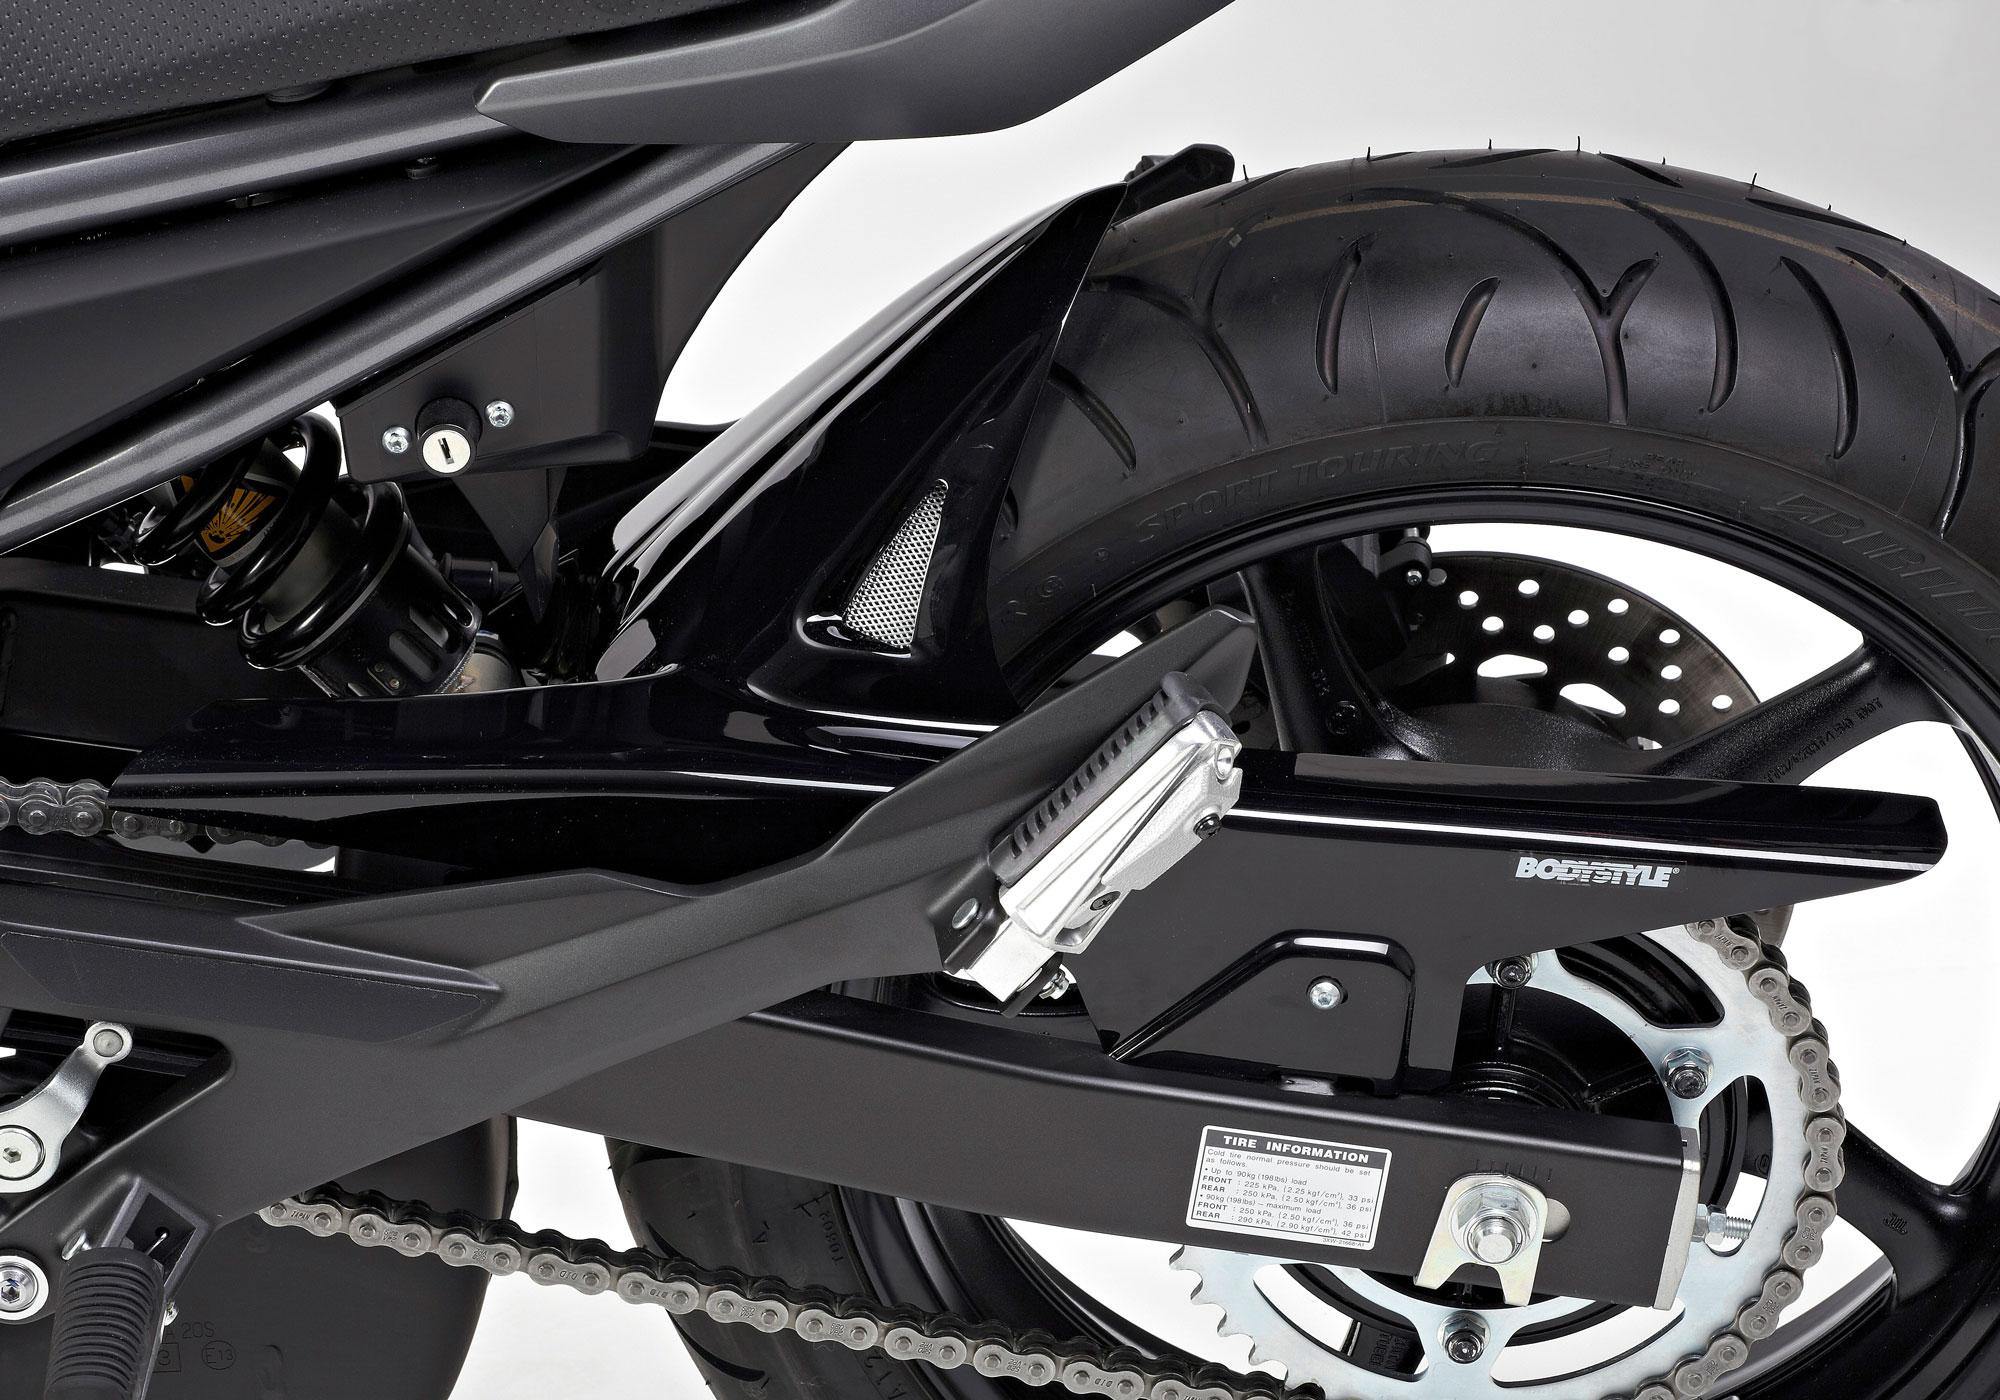 xj6 yamaha hurric onlineshop f r motorradteile. Black Bedroom Furniture Sets. Home Design Ideas